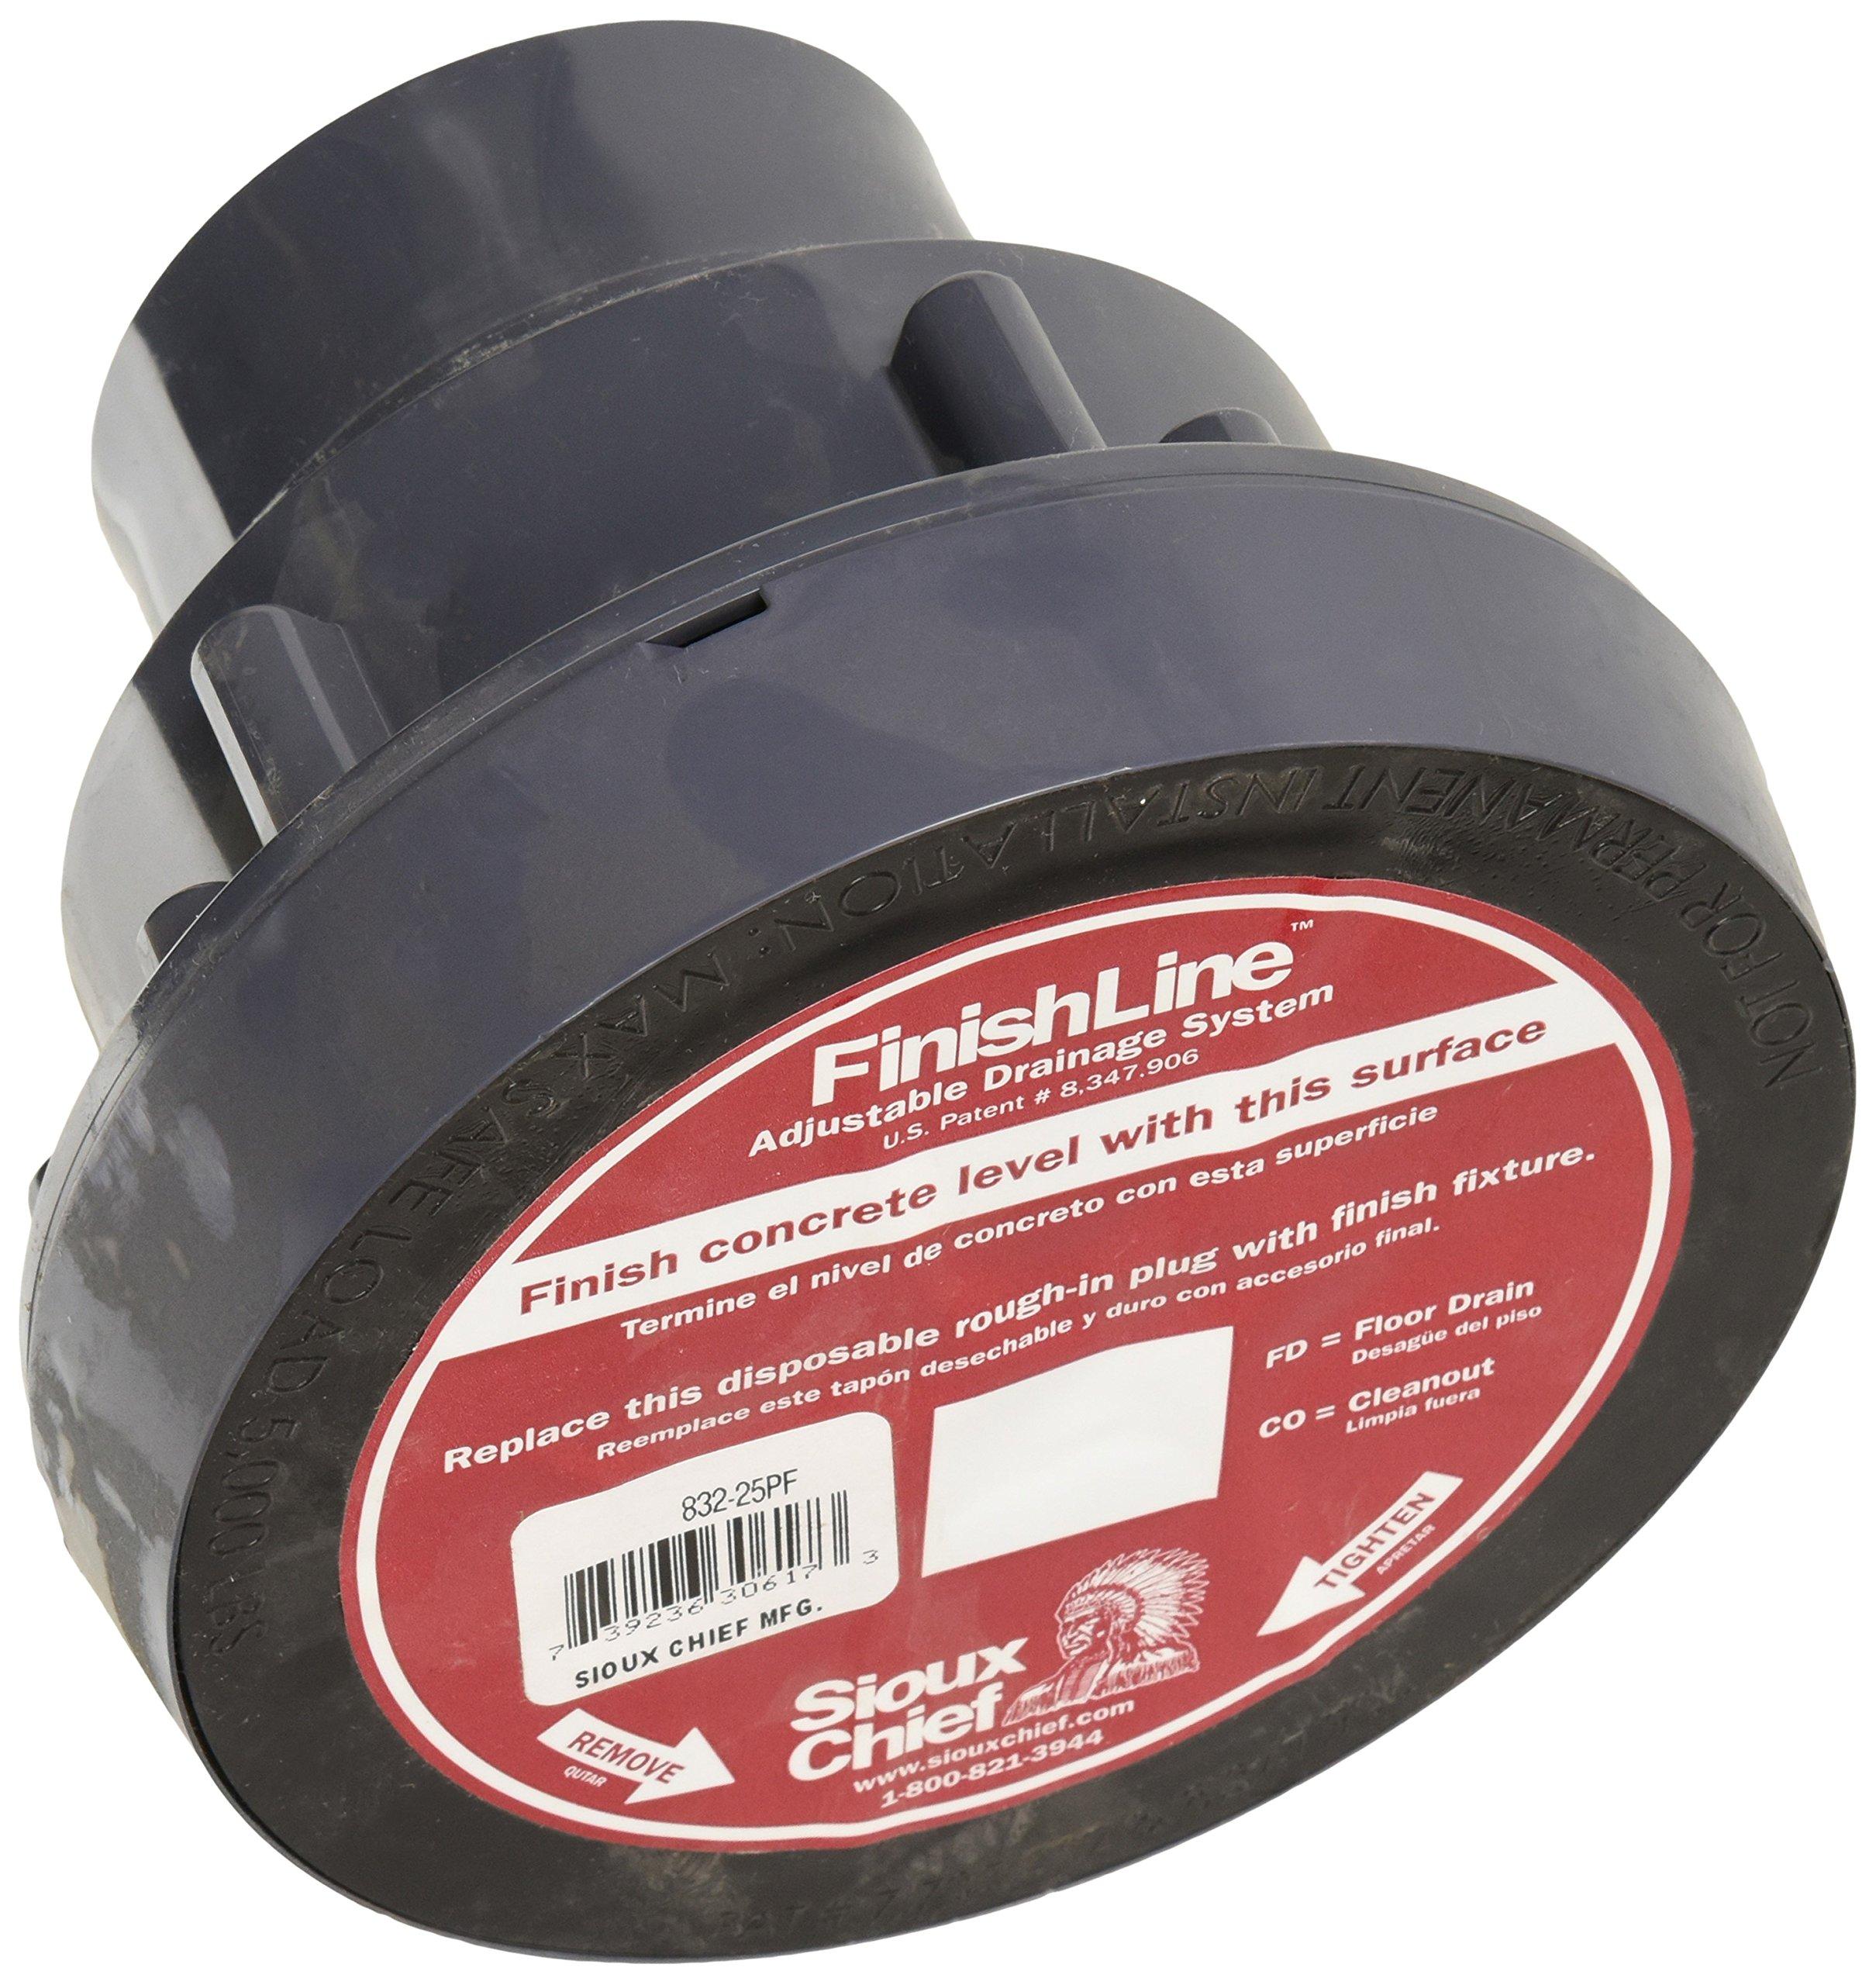 Soux Chief 832-25PNR Adjustable Floor Drain Schlage 40 Hub Connection, 5 1/2'',